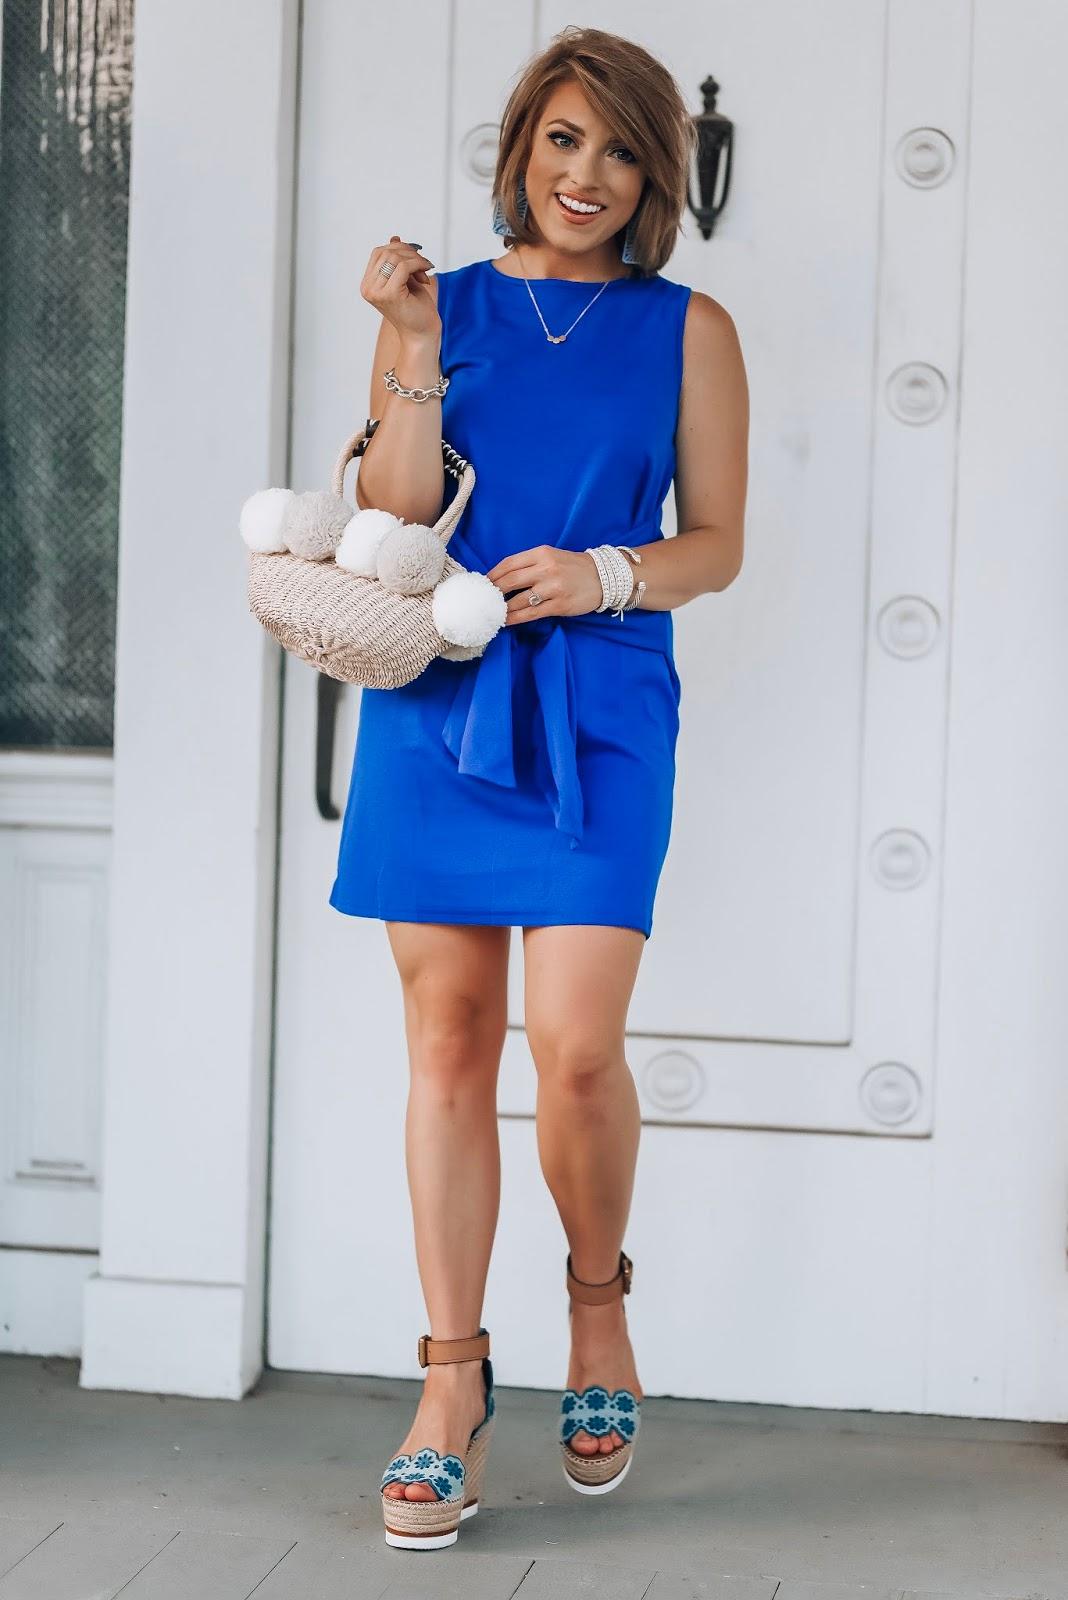 Under $20 Tie Front Dress + Recent Amazon Finds - Something Delightful Blog